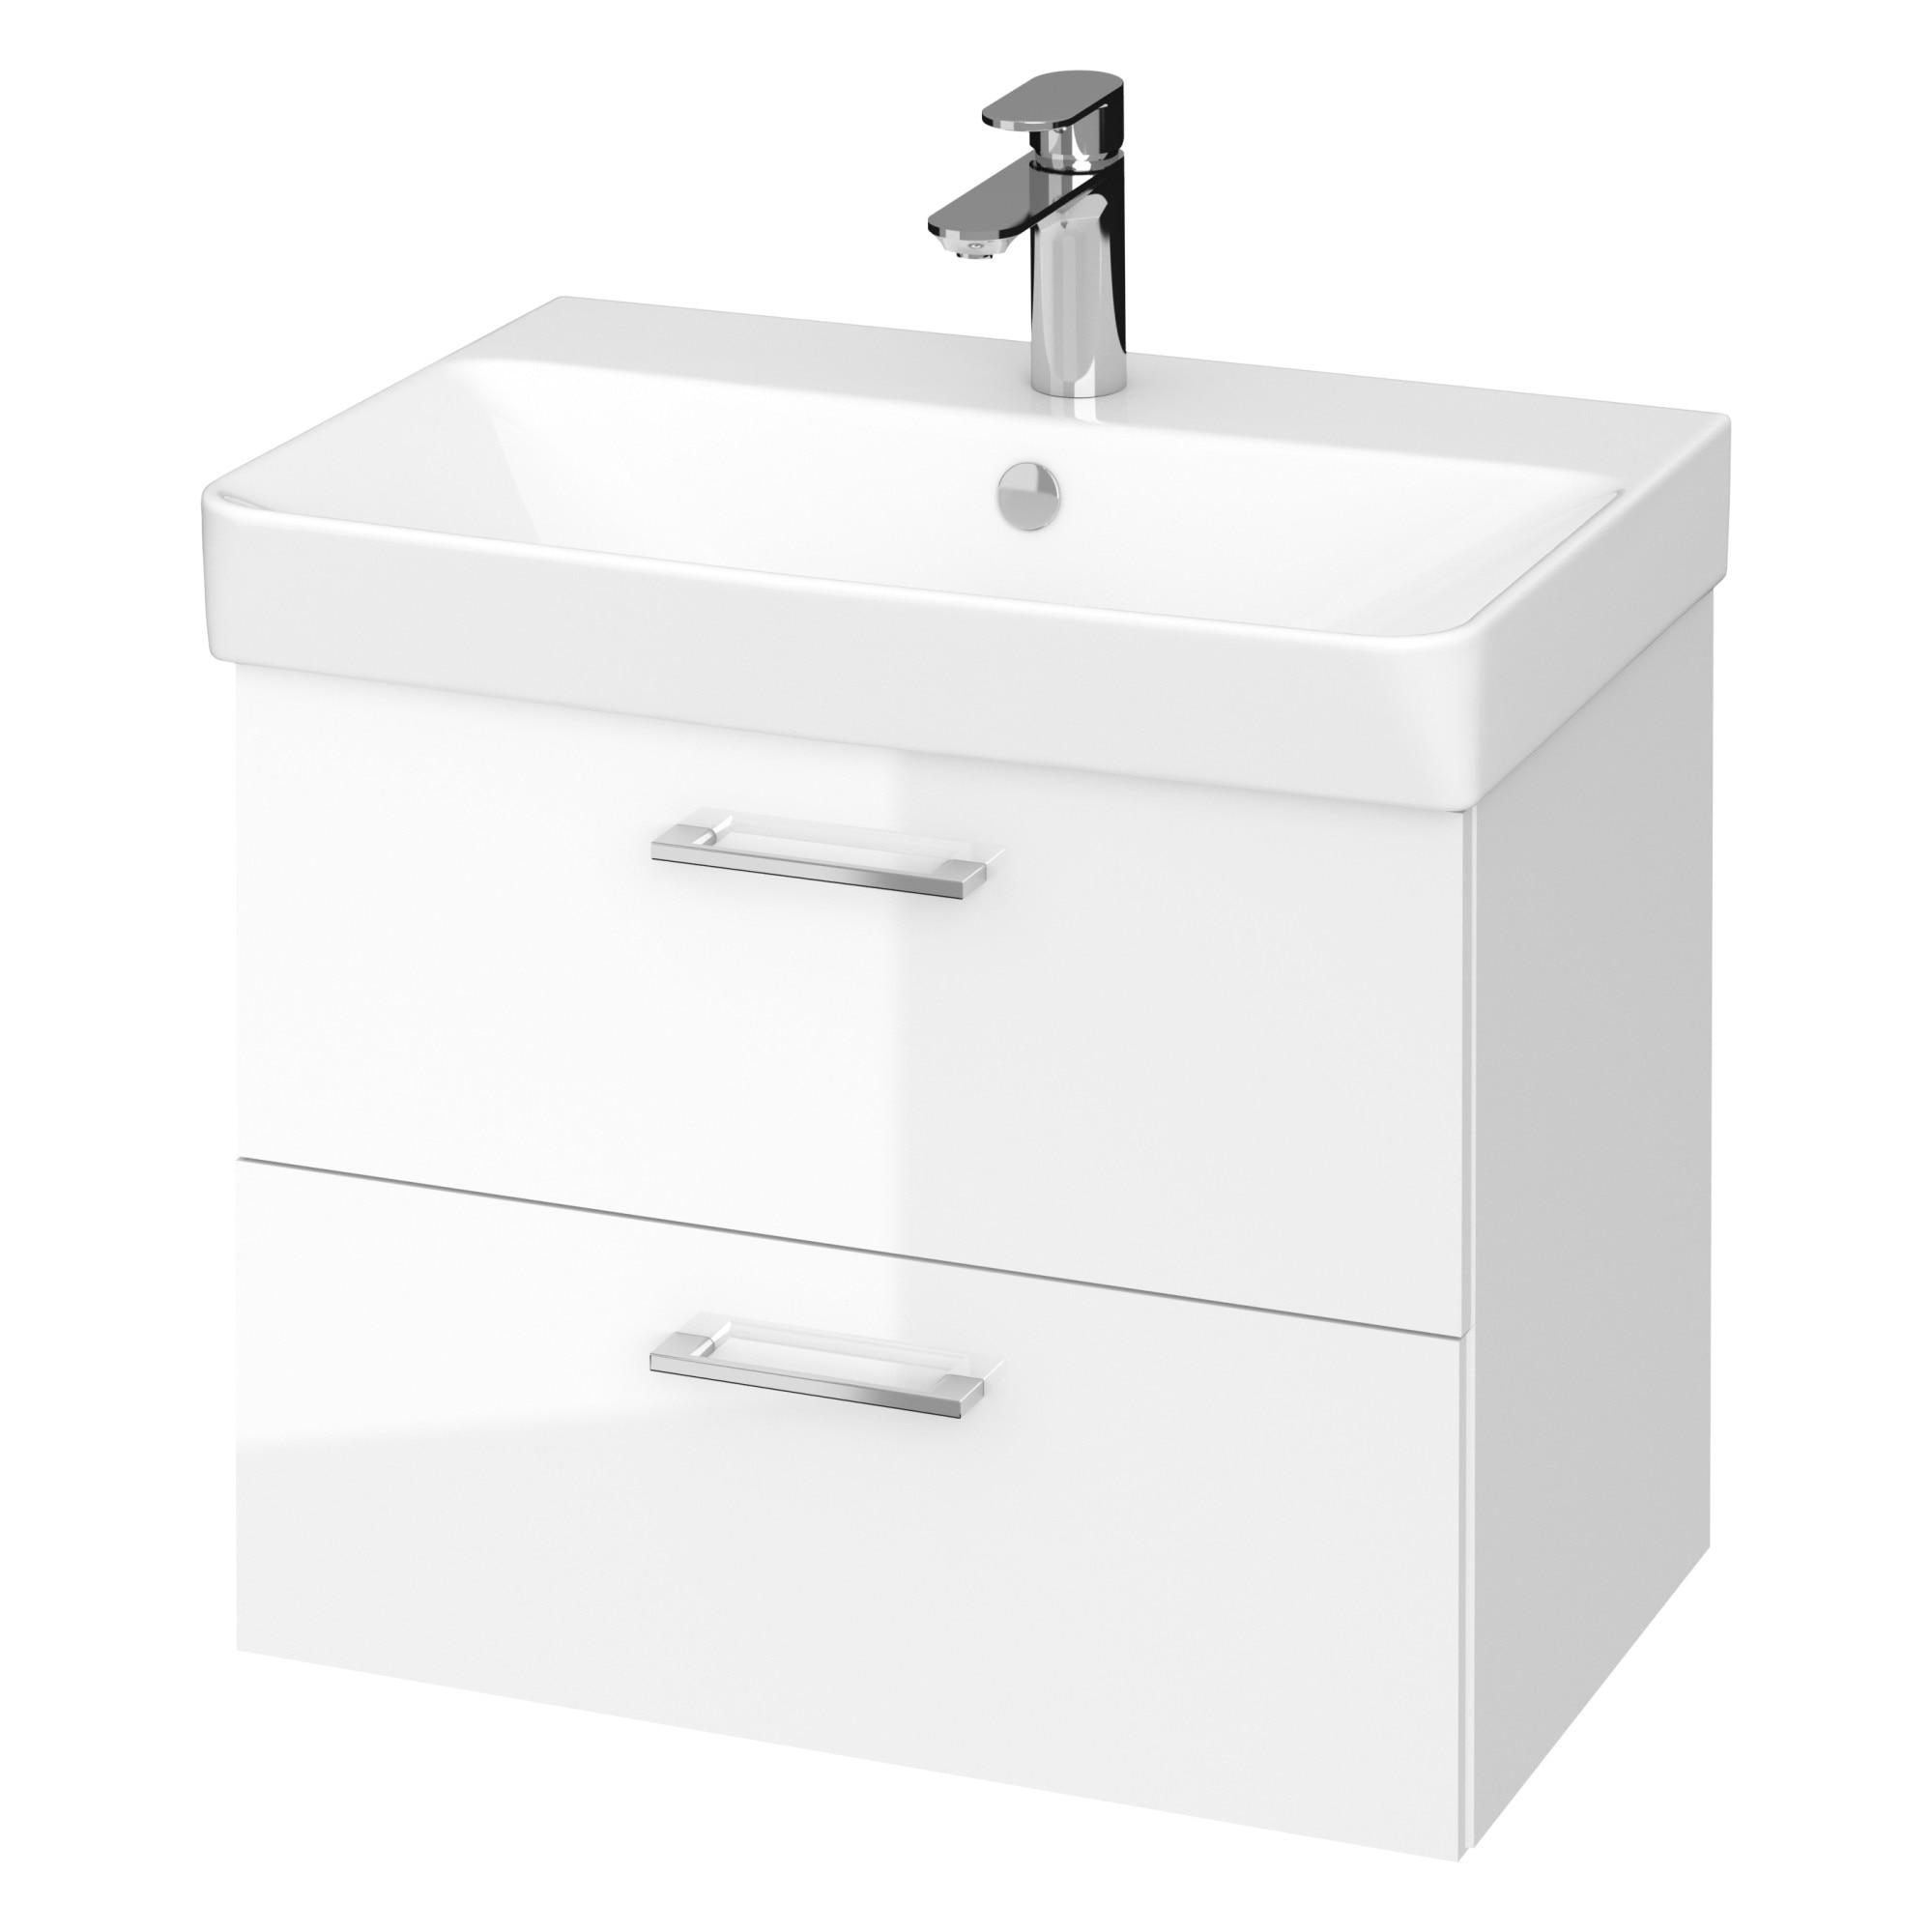 Fotografie Set baza mobilier Cersanit Lara Slim 60 + Lavoar Cersanit Mille Slim 60, PAL lacuit, 2 sertare, inchidere lenta, 59.4x37.5x46 cm, Alb